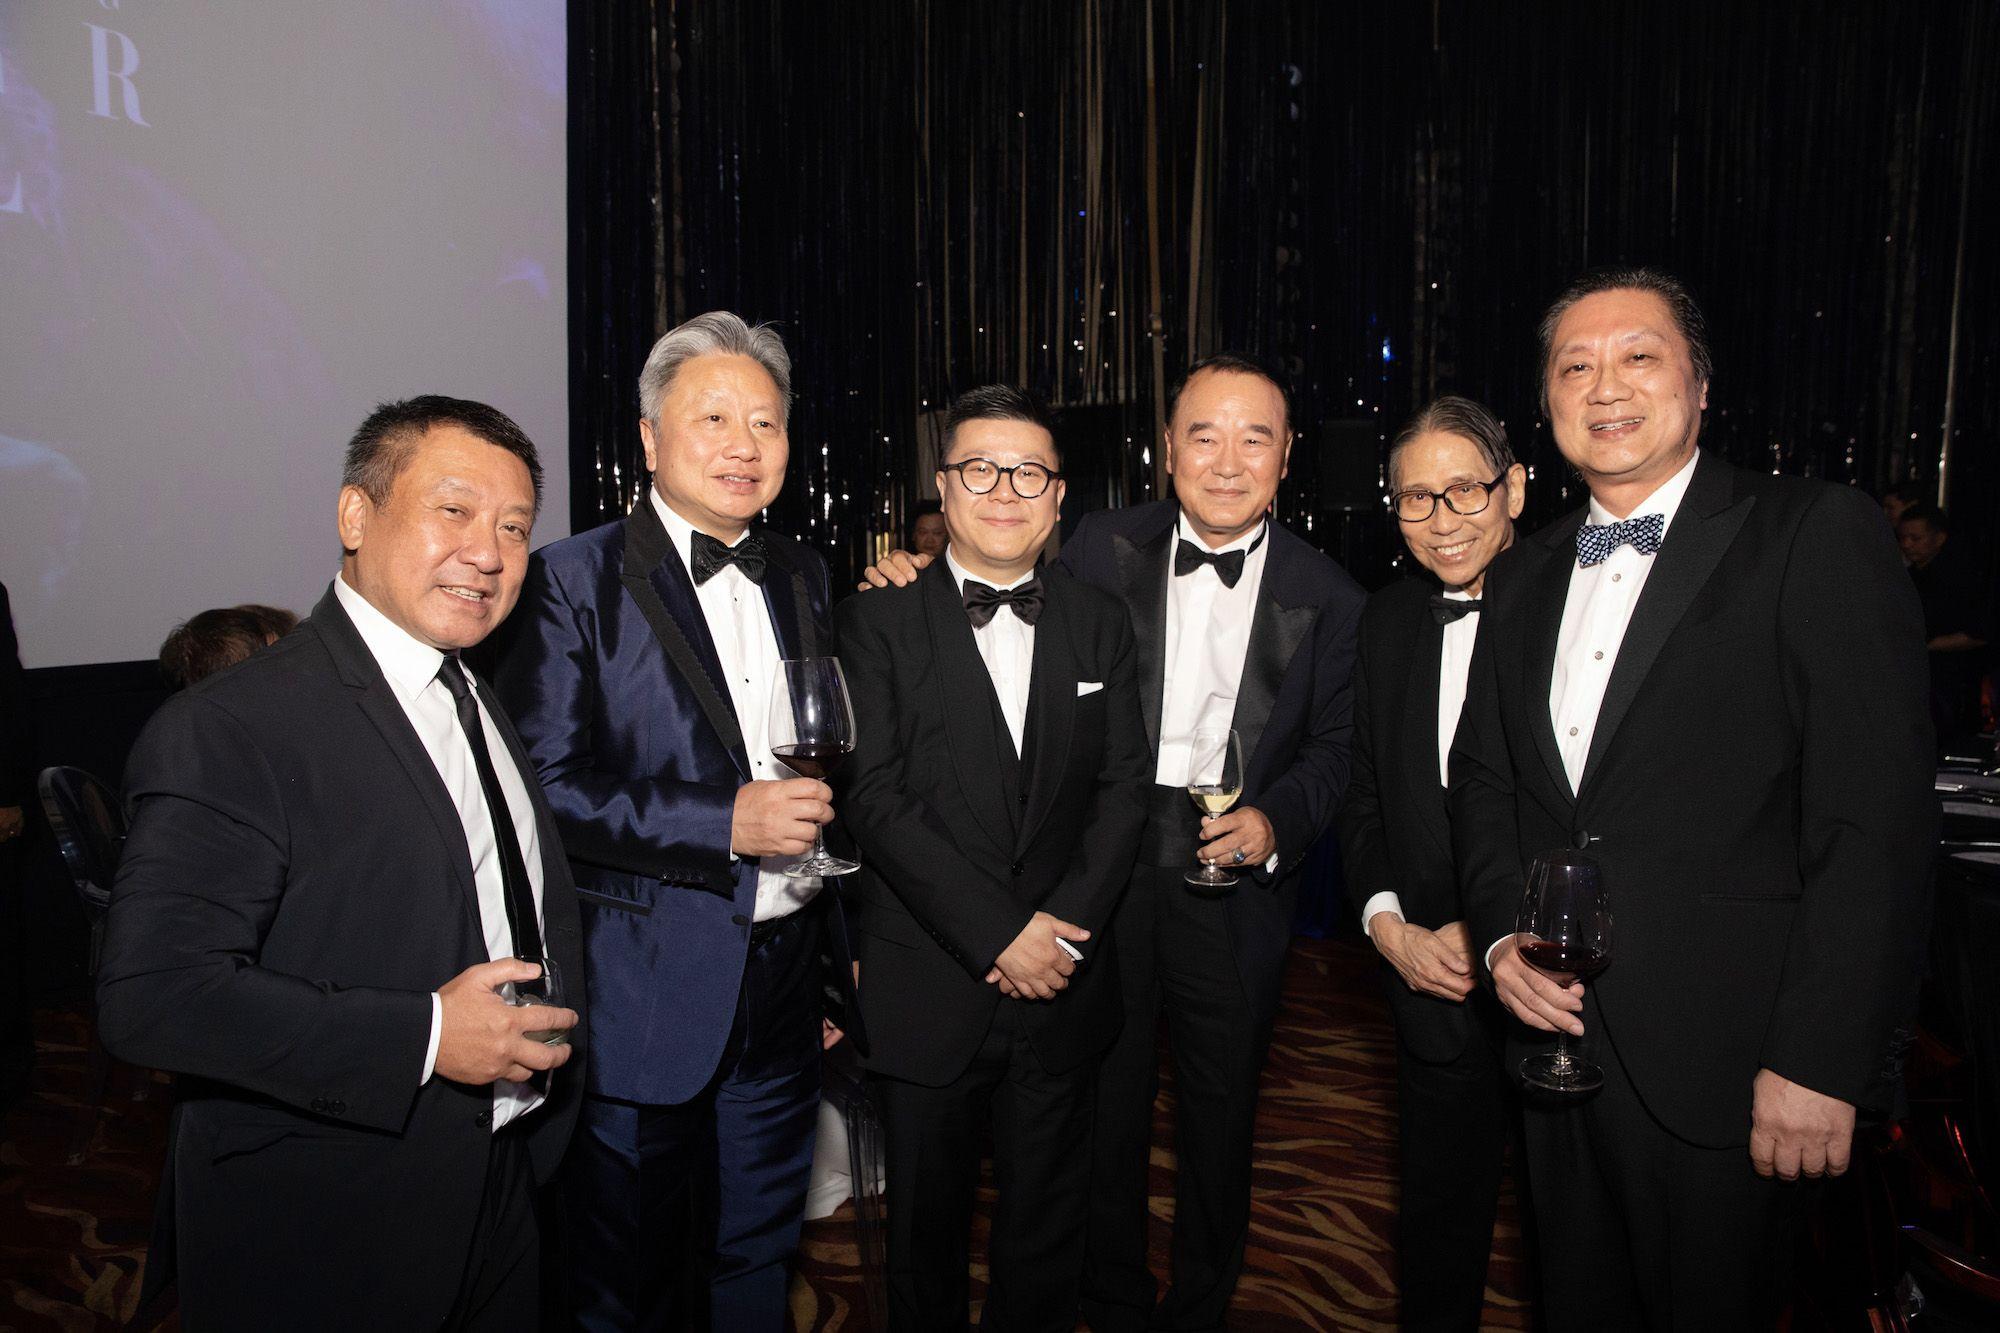 Nissim Tse, Jimmy Tang, Matthew Lam, Dennis Sun, Che-Hung Leong, Daniel Chan